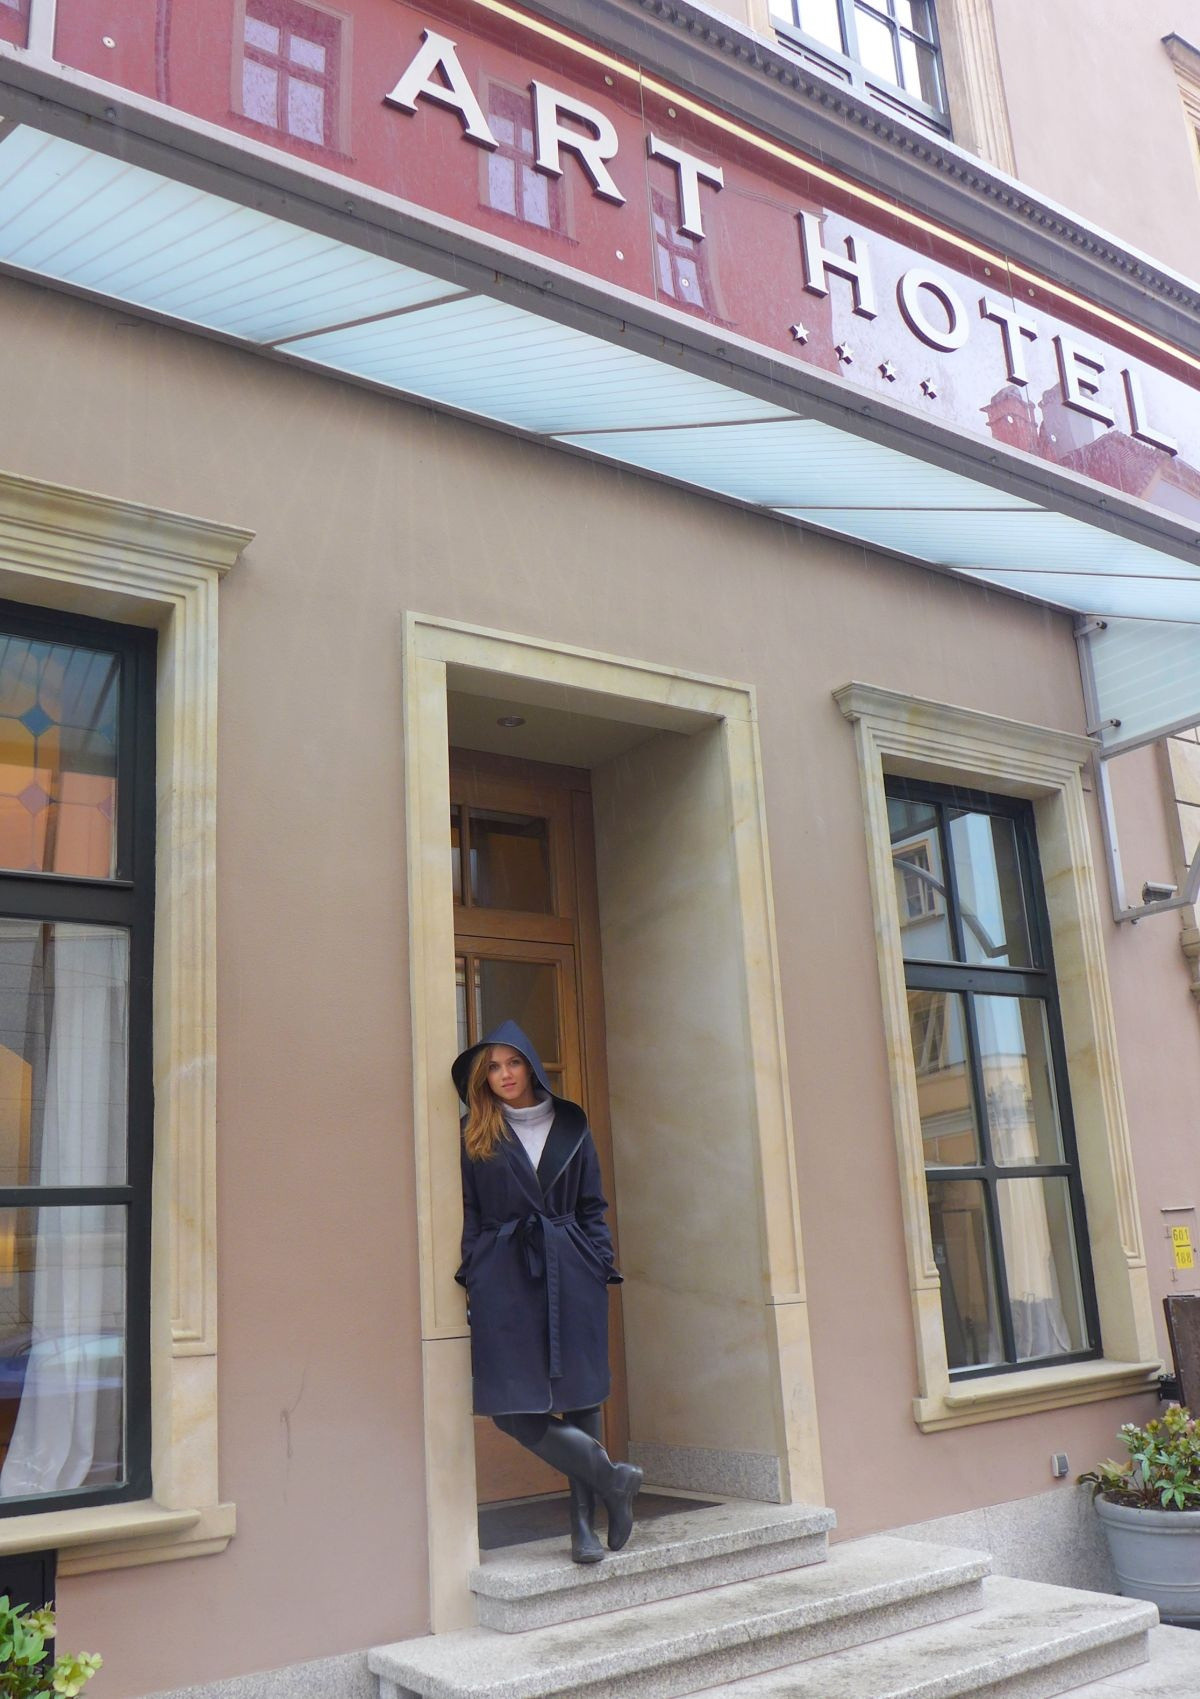 kaczorowska_art_hotel1